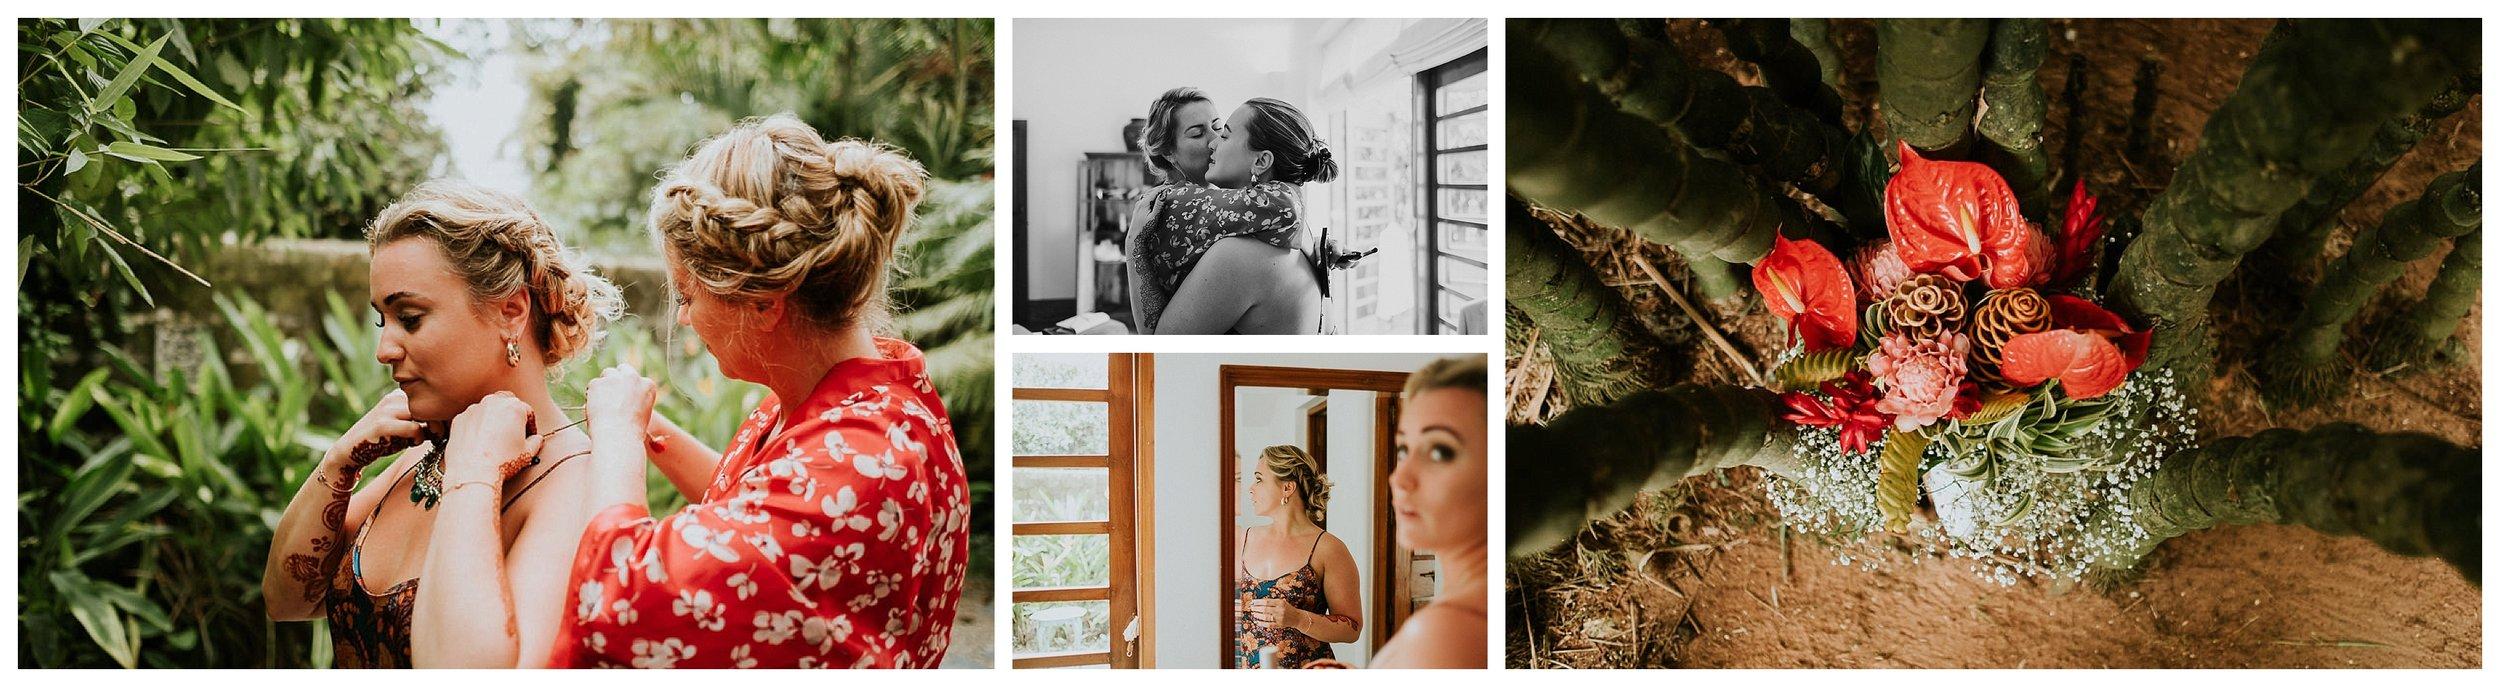 Goa Destination Wedding Photographer India Colouful Fun Joanna Nicole Photography Coco Shambhala7.jpg